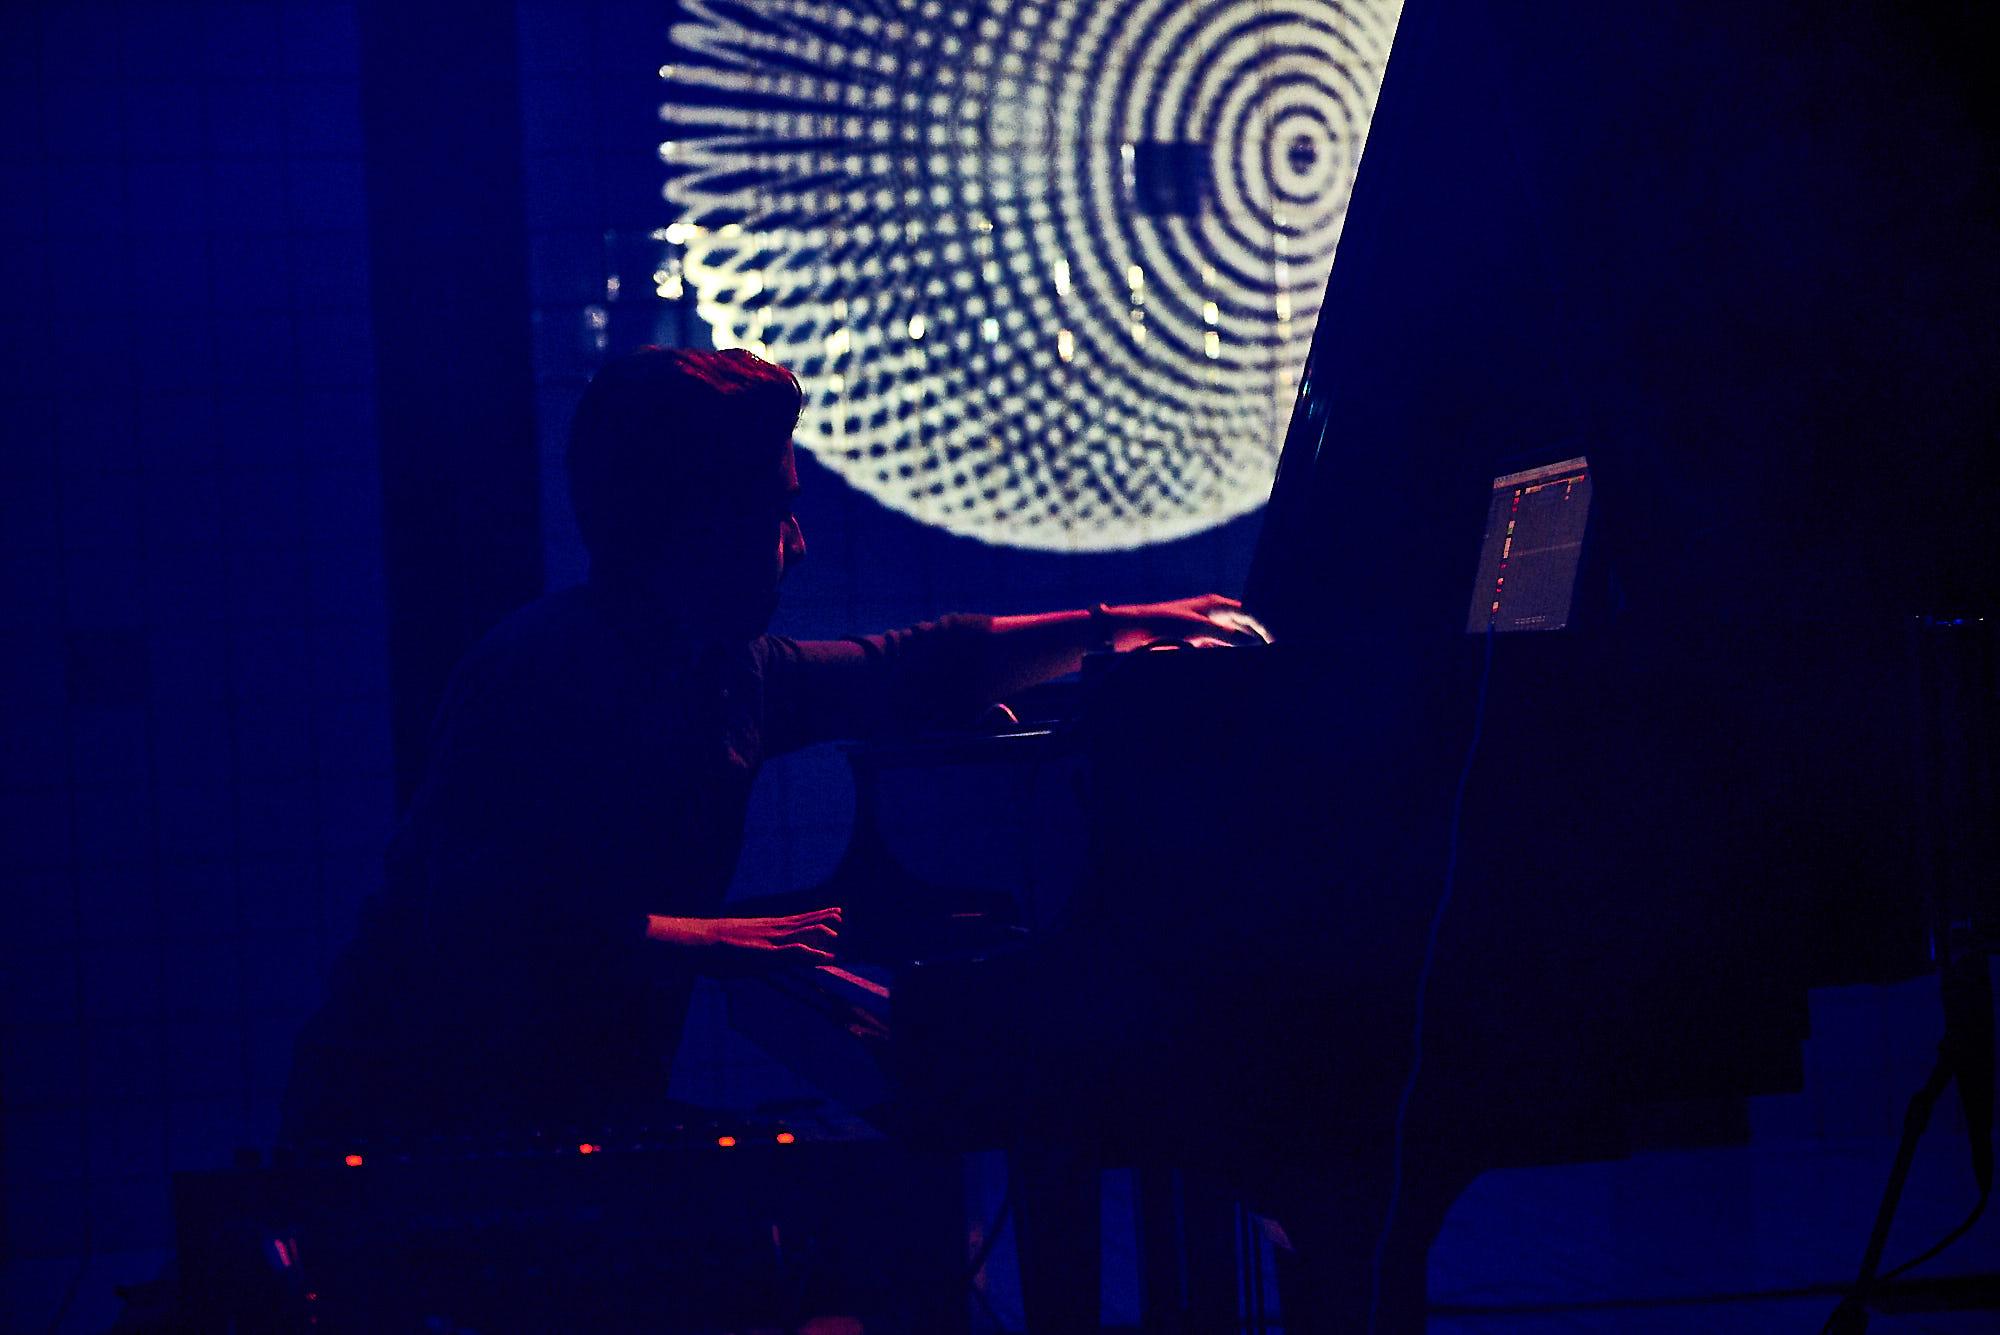 Piano im Pool Festival Luzern 2018, Adriano Koch